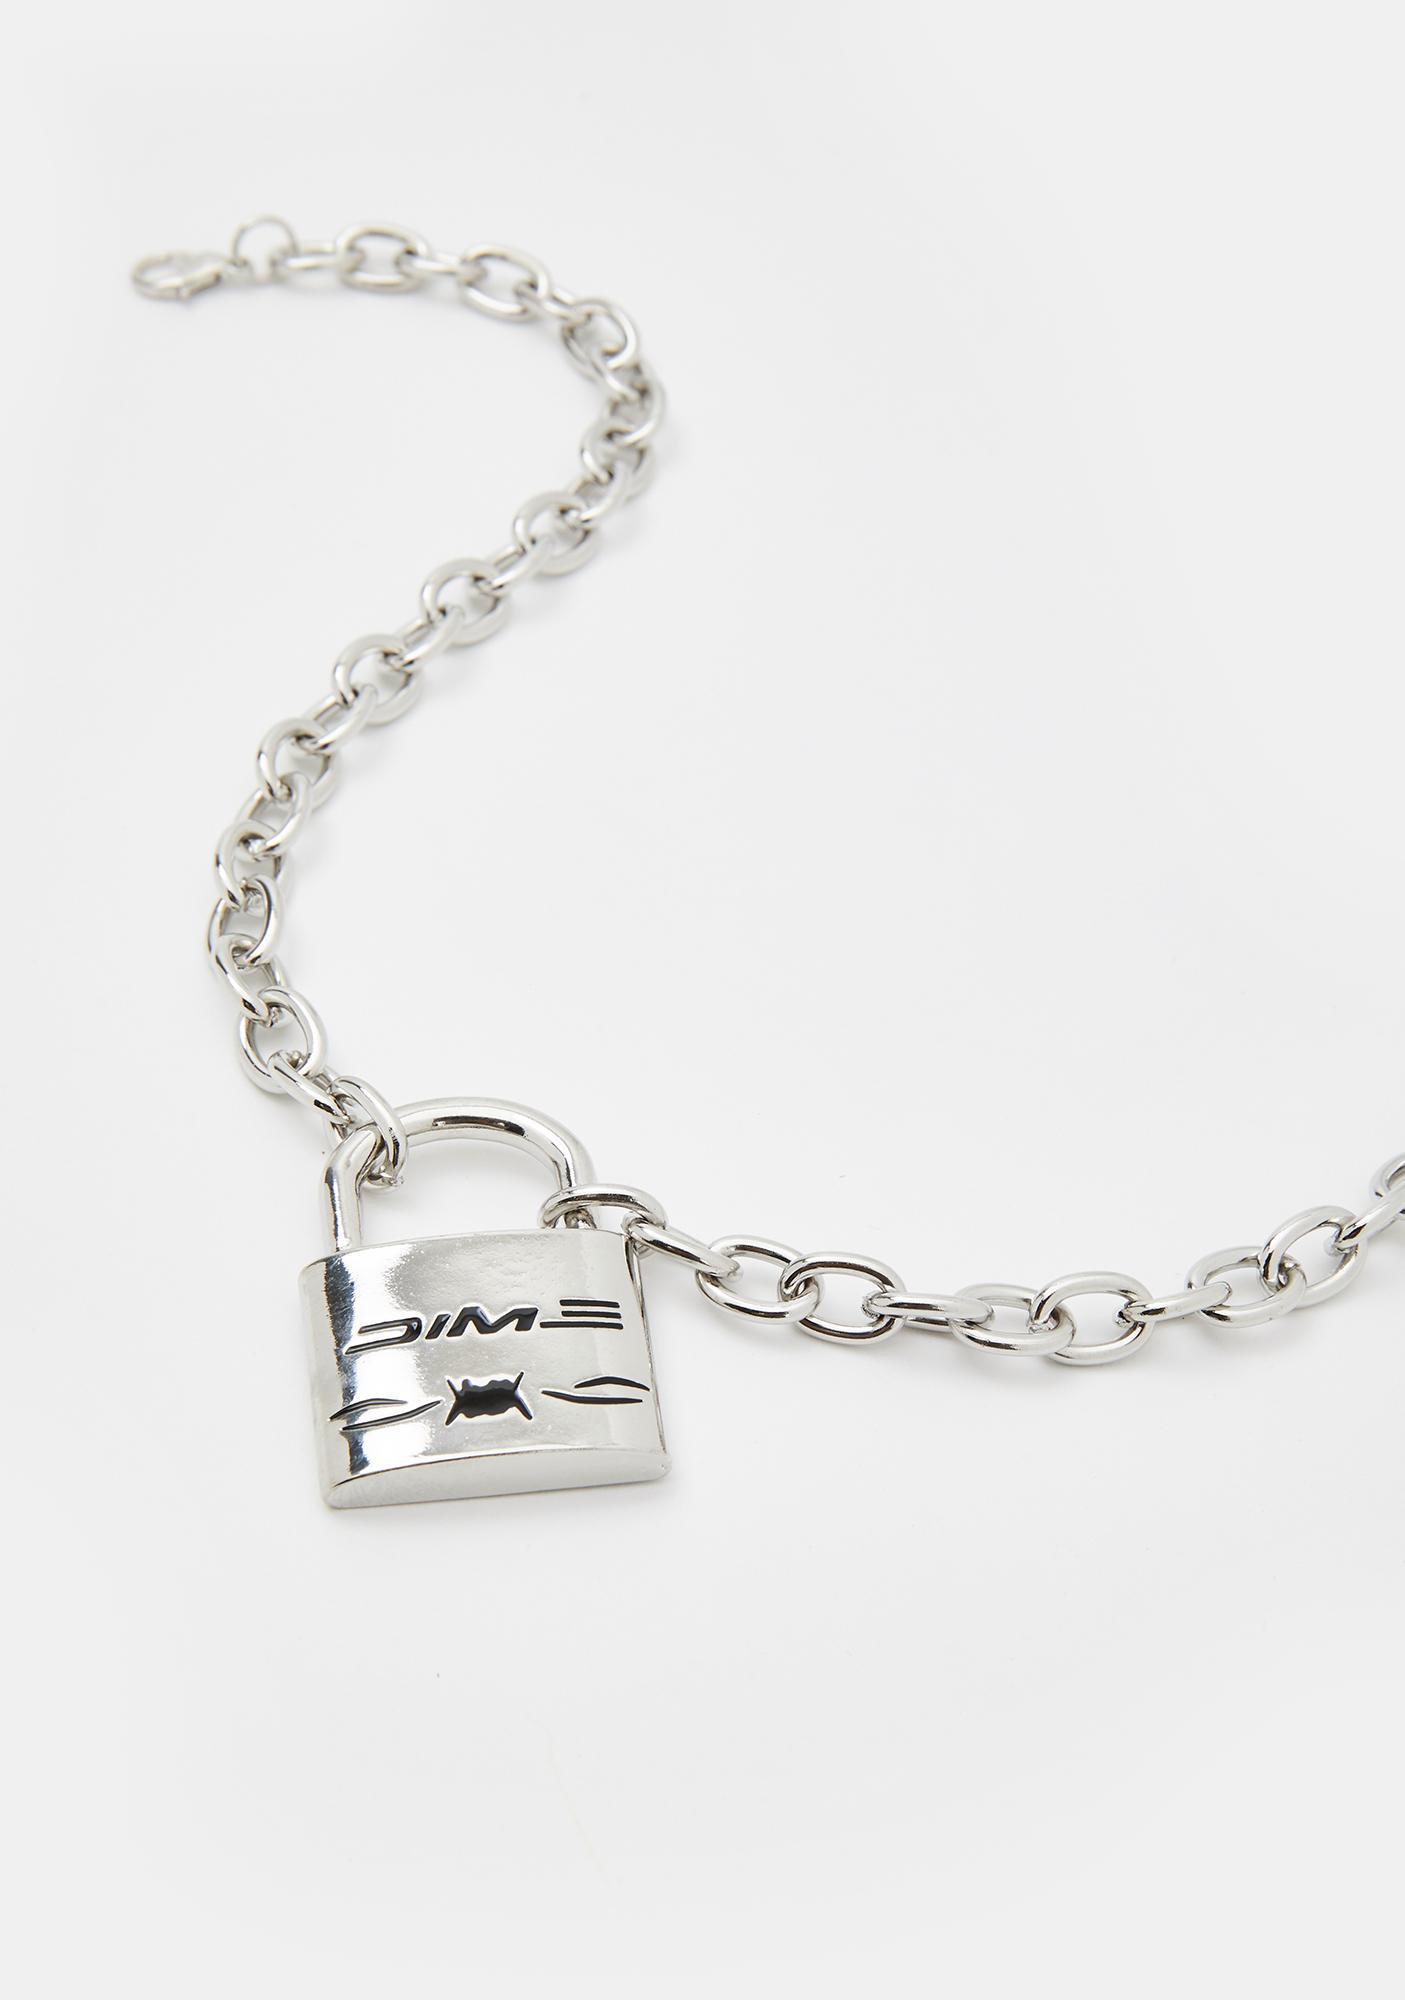 Cuffin' SZN Lock Necklace